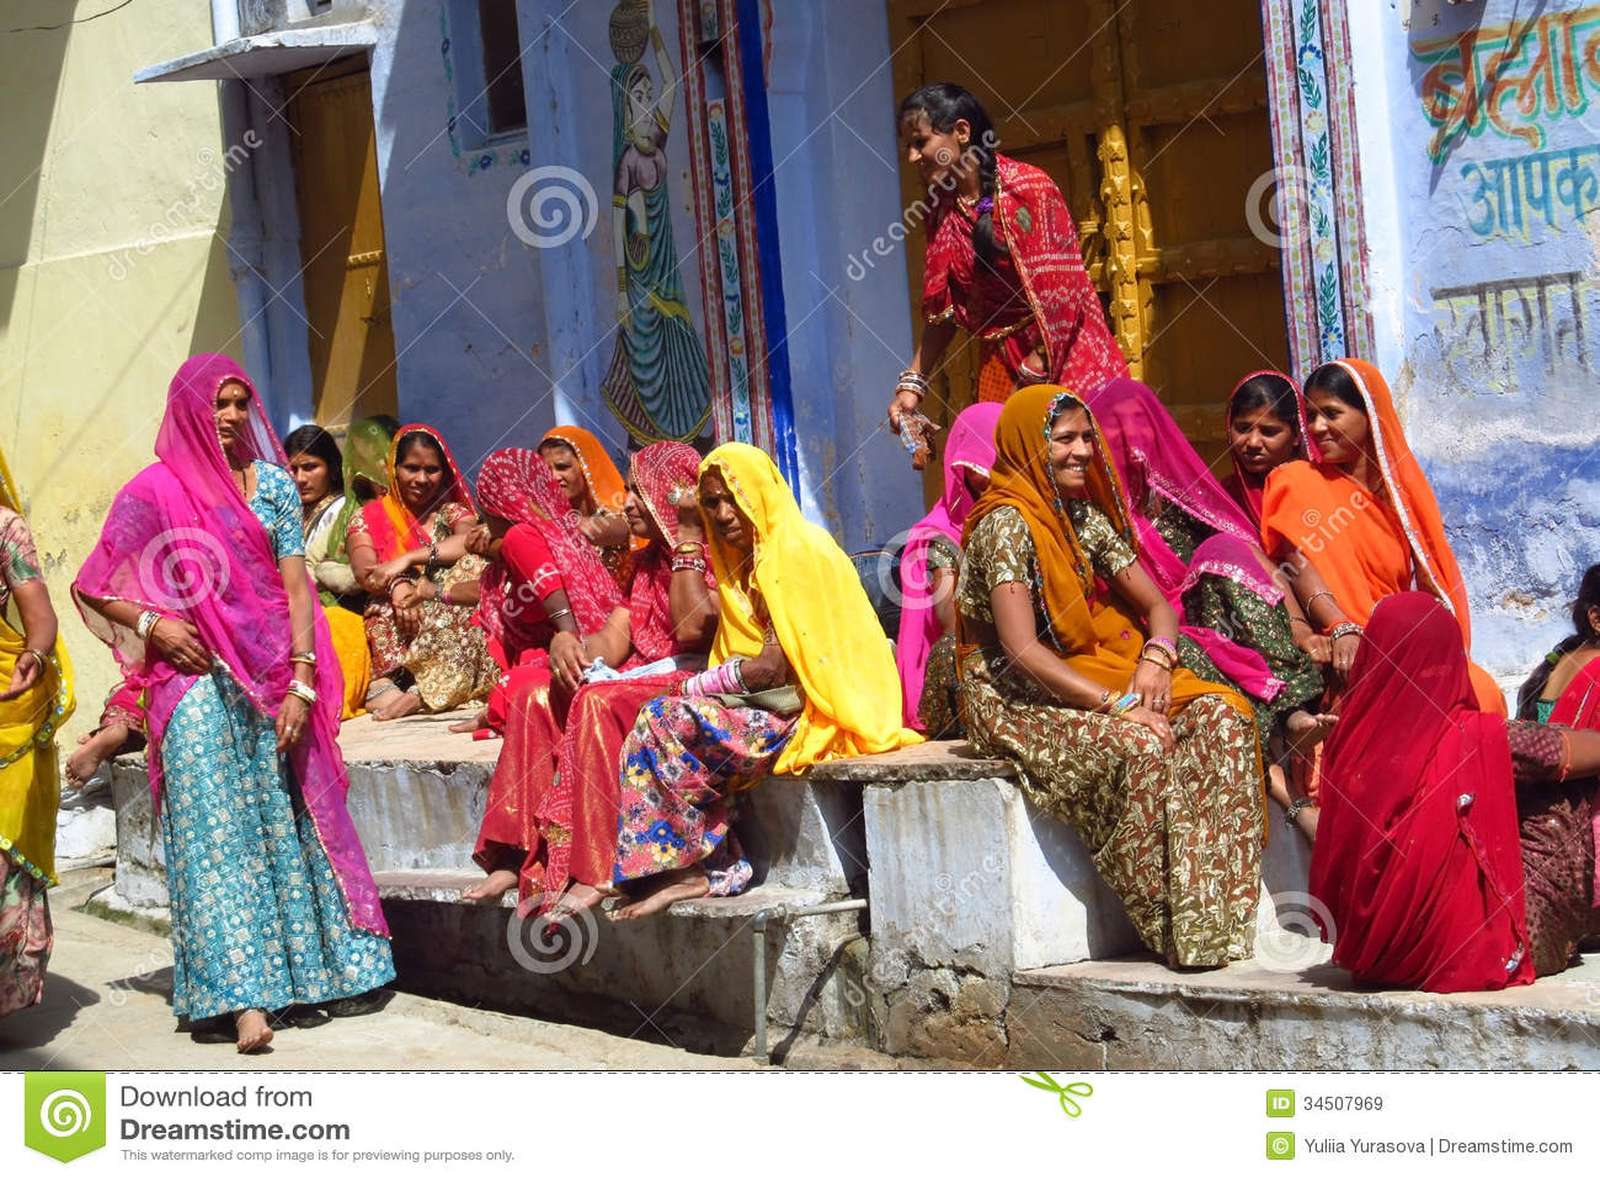 Hindu women dressed in colorful sari in Indian street market